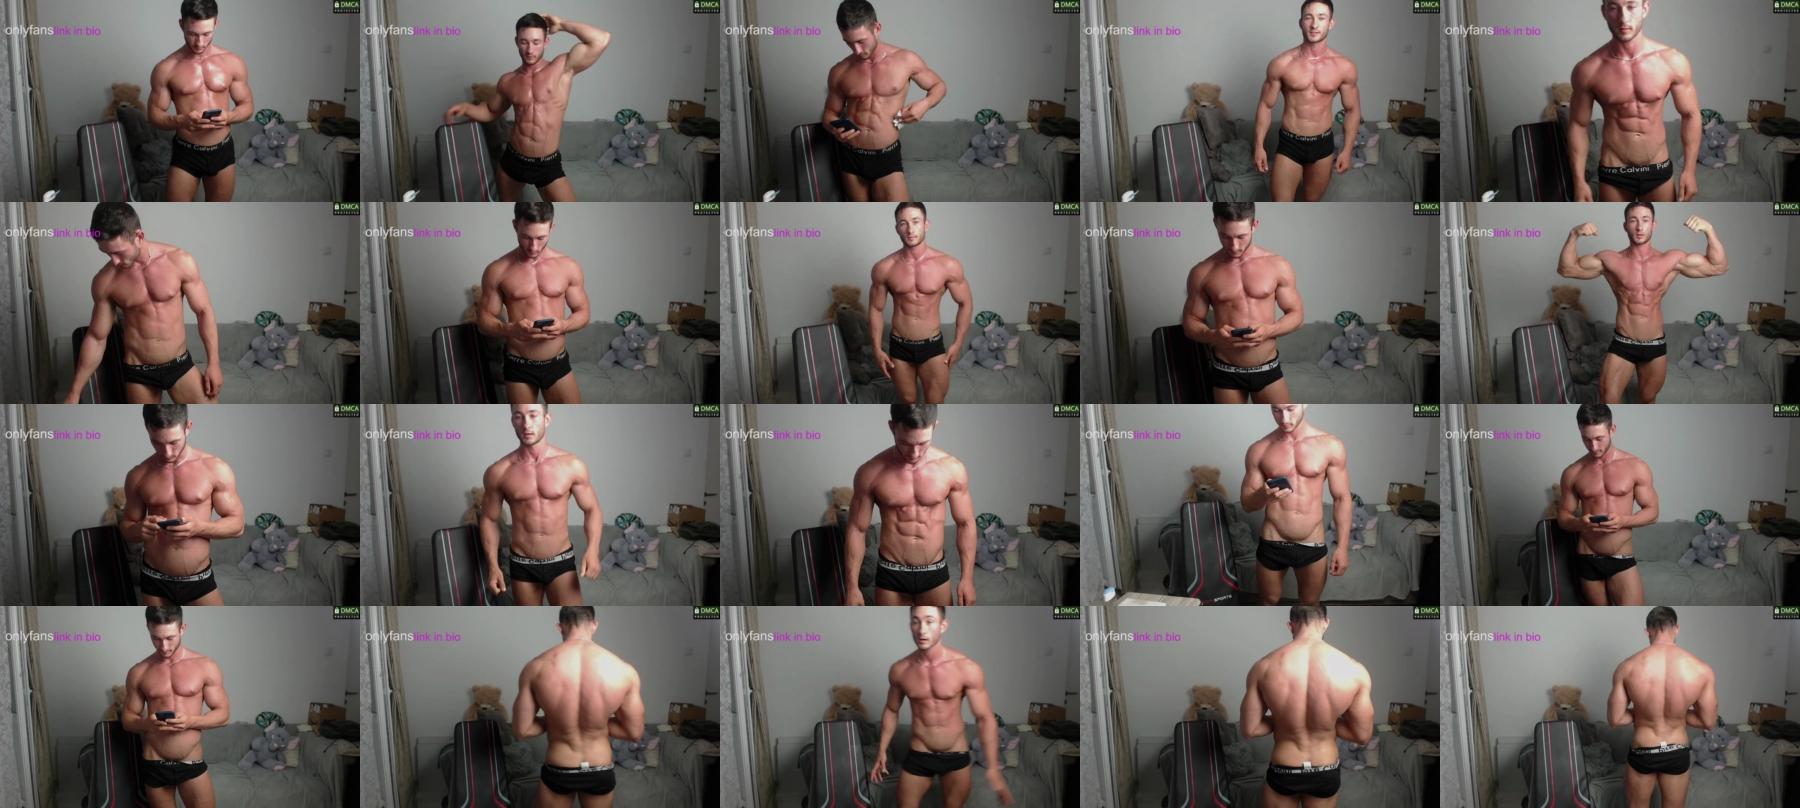 Davidben99 Chaturbate 22-07-2021 video mistress